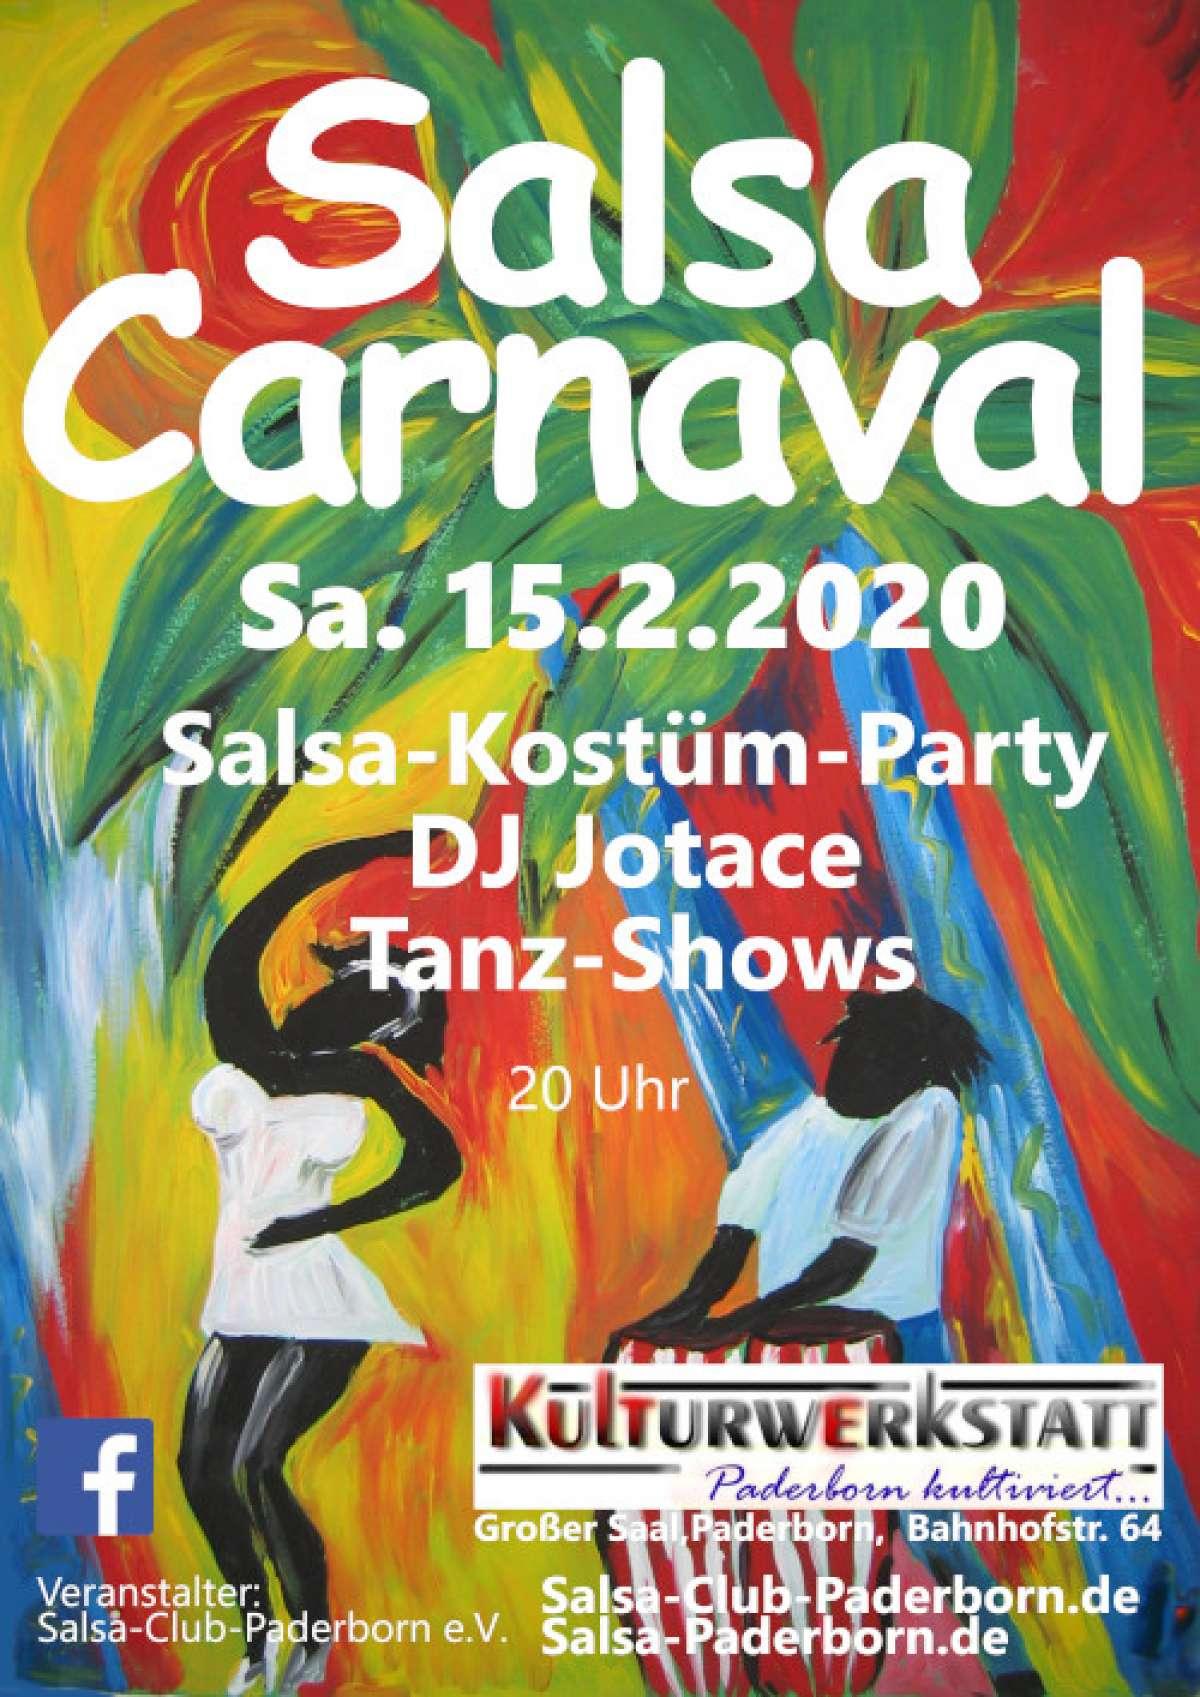 Salsa-Carnaval - DJ Jotace - Kulturwerkstatt (Großer Saal) - Paderborn